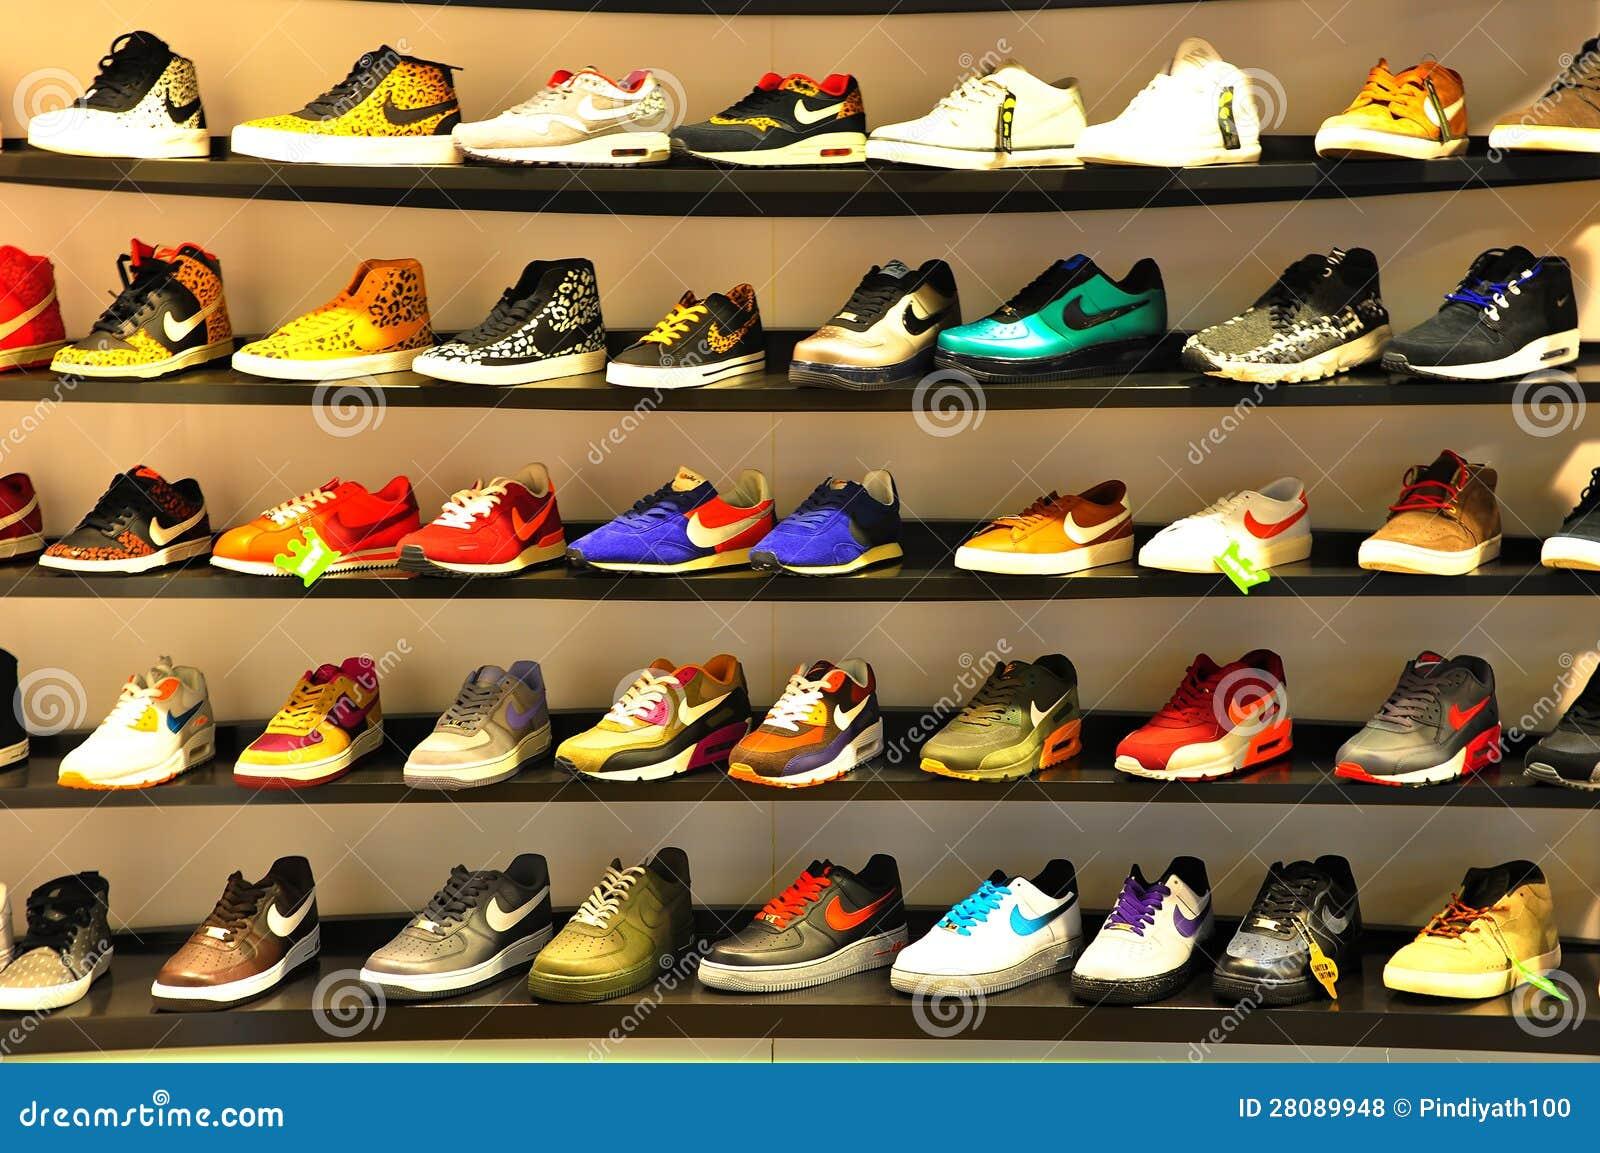 1de28eb2fa Αθλητικά παπούτσια της Nike Εκδοτική Στοκ Εικόνες - εικόνα από ...